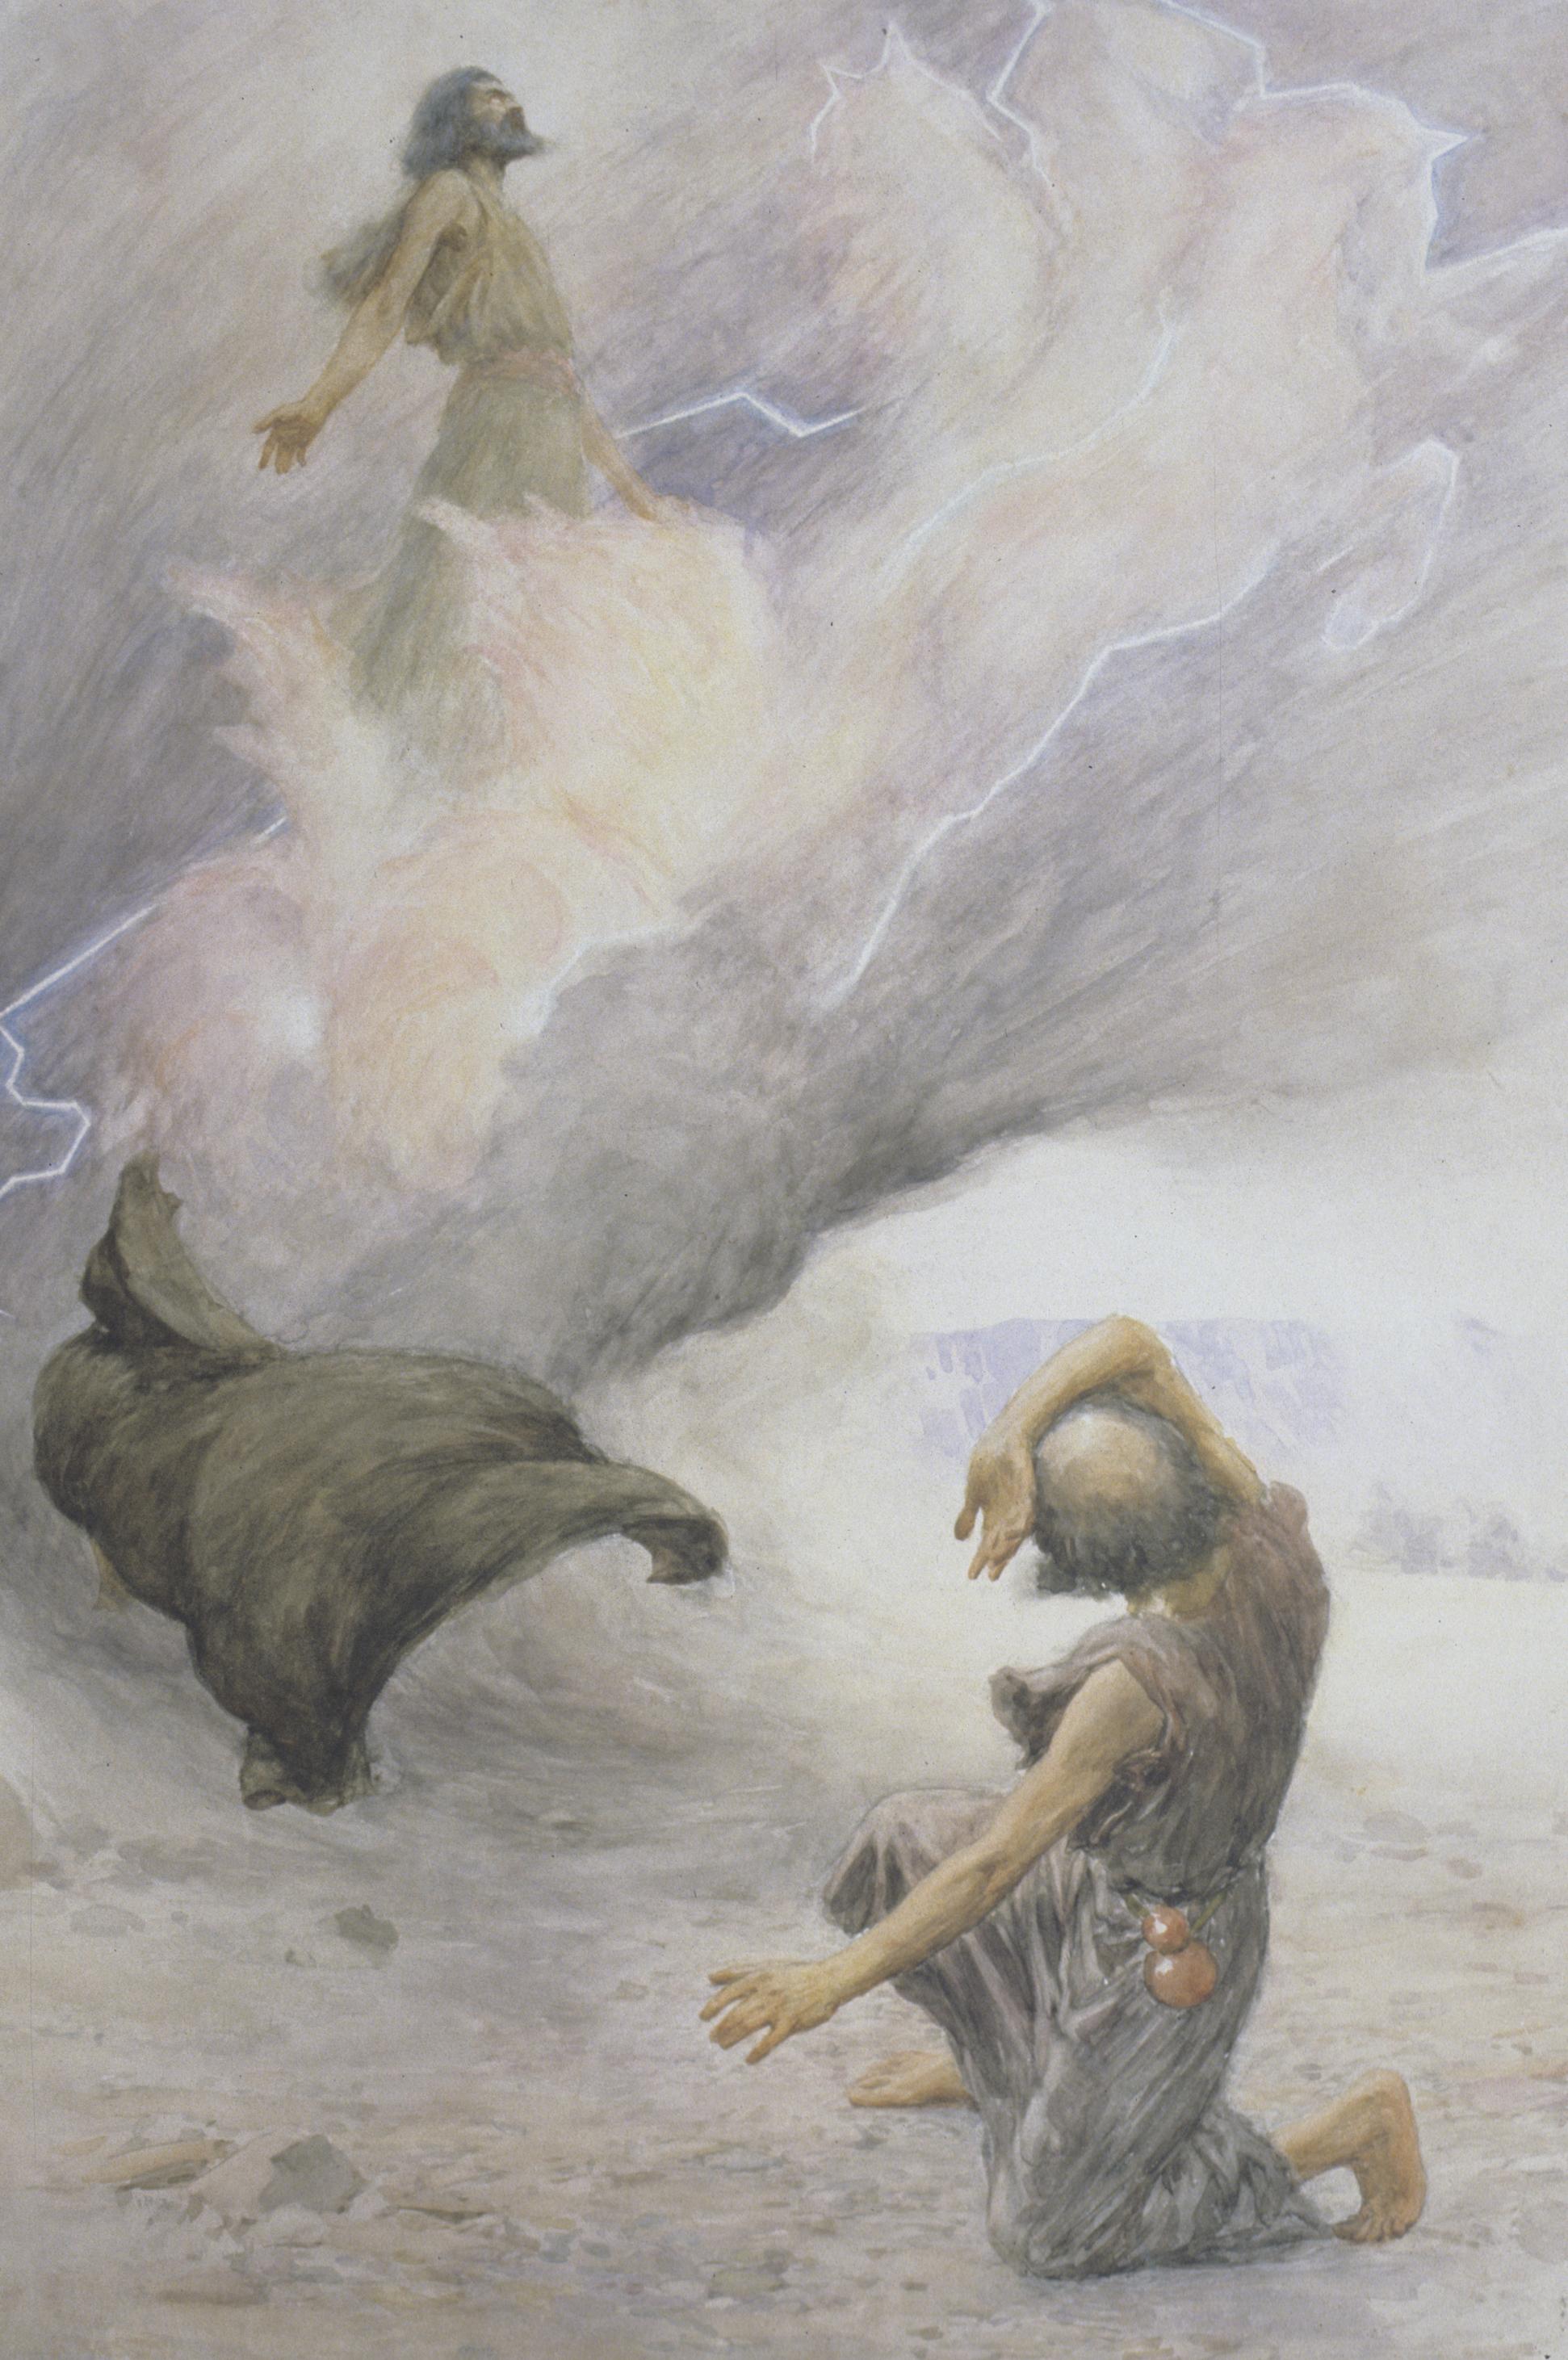 Elijah Ascending into Heaven, by W. H. Margetson